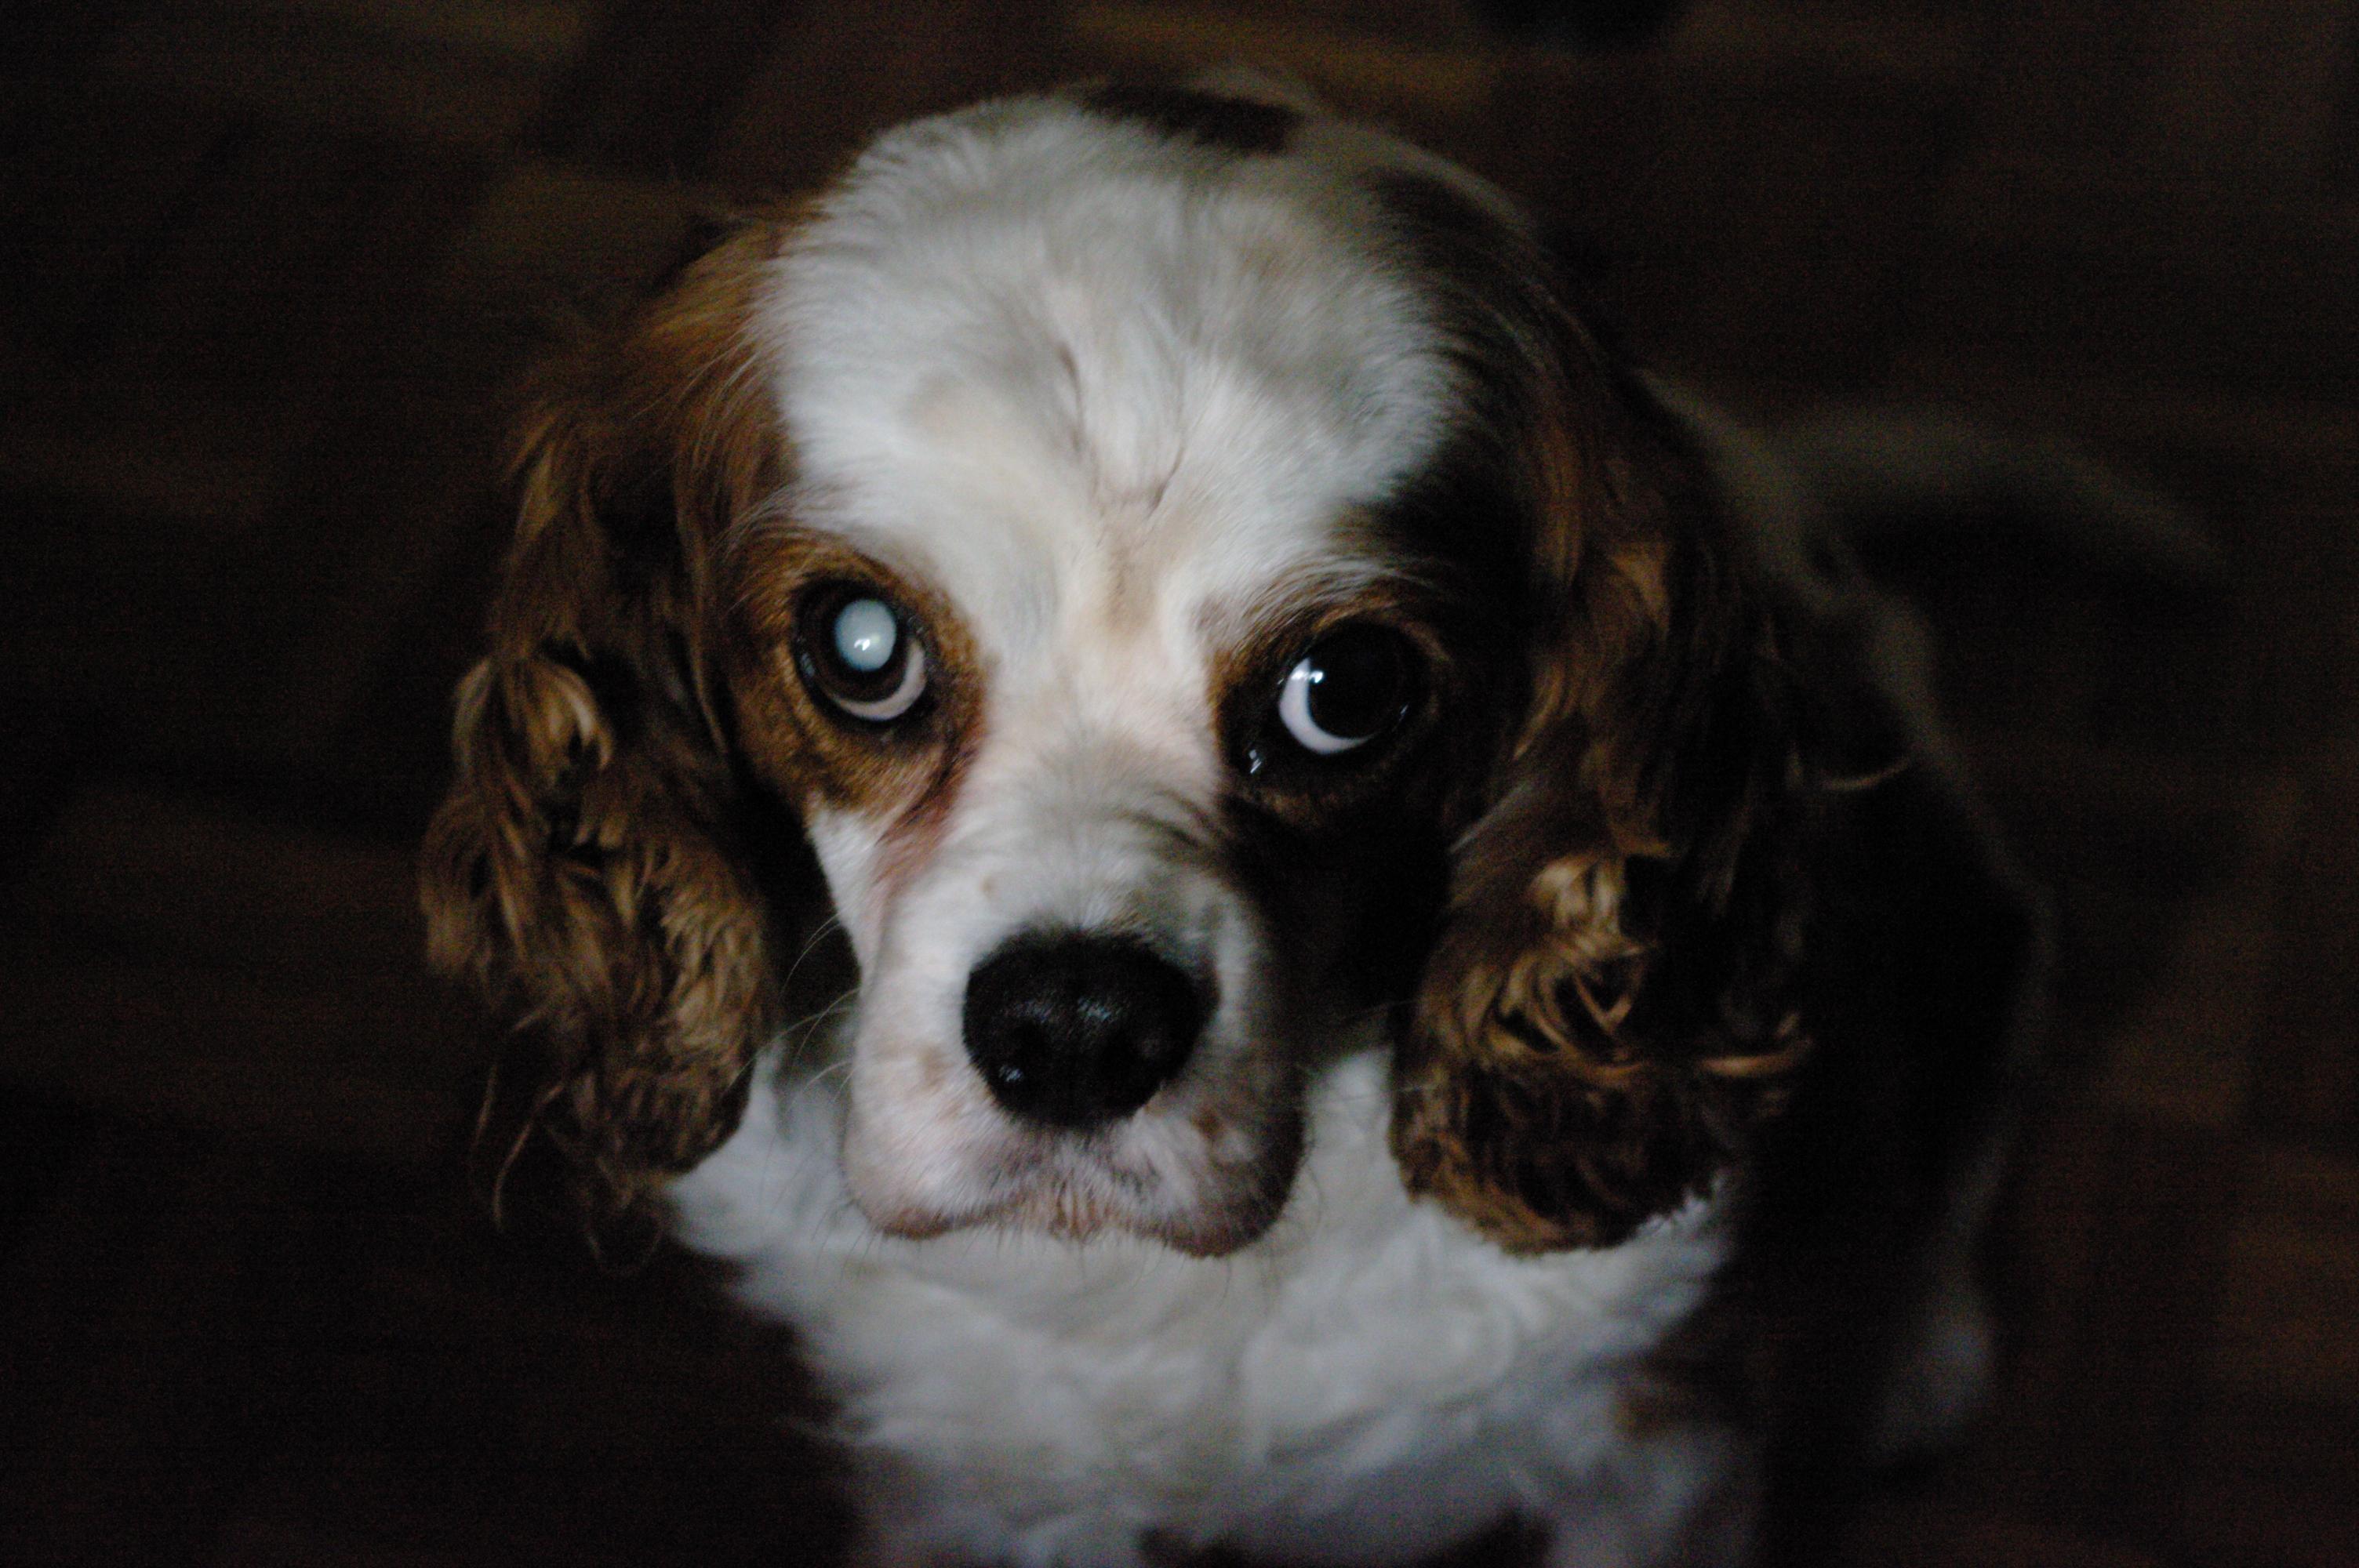 Portrait of a king charles dog, Animal, Brown, Cavalierkingchar, Cute, HQ Photo